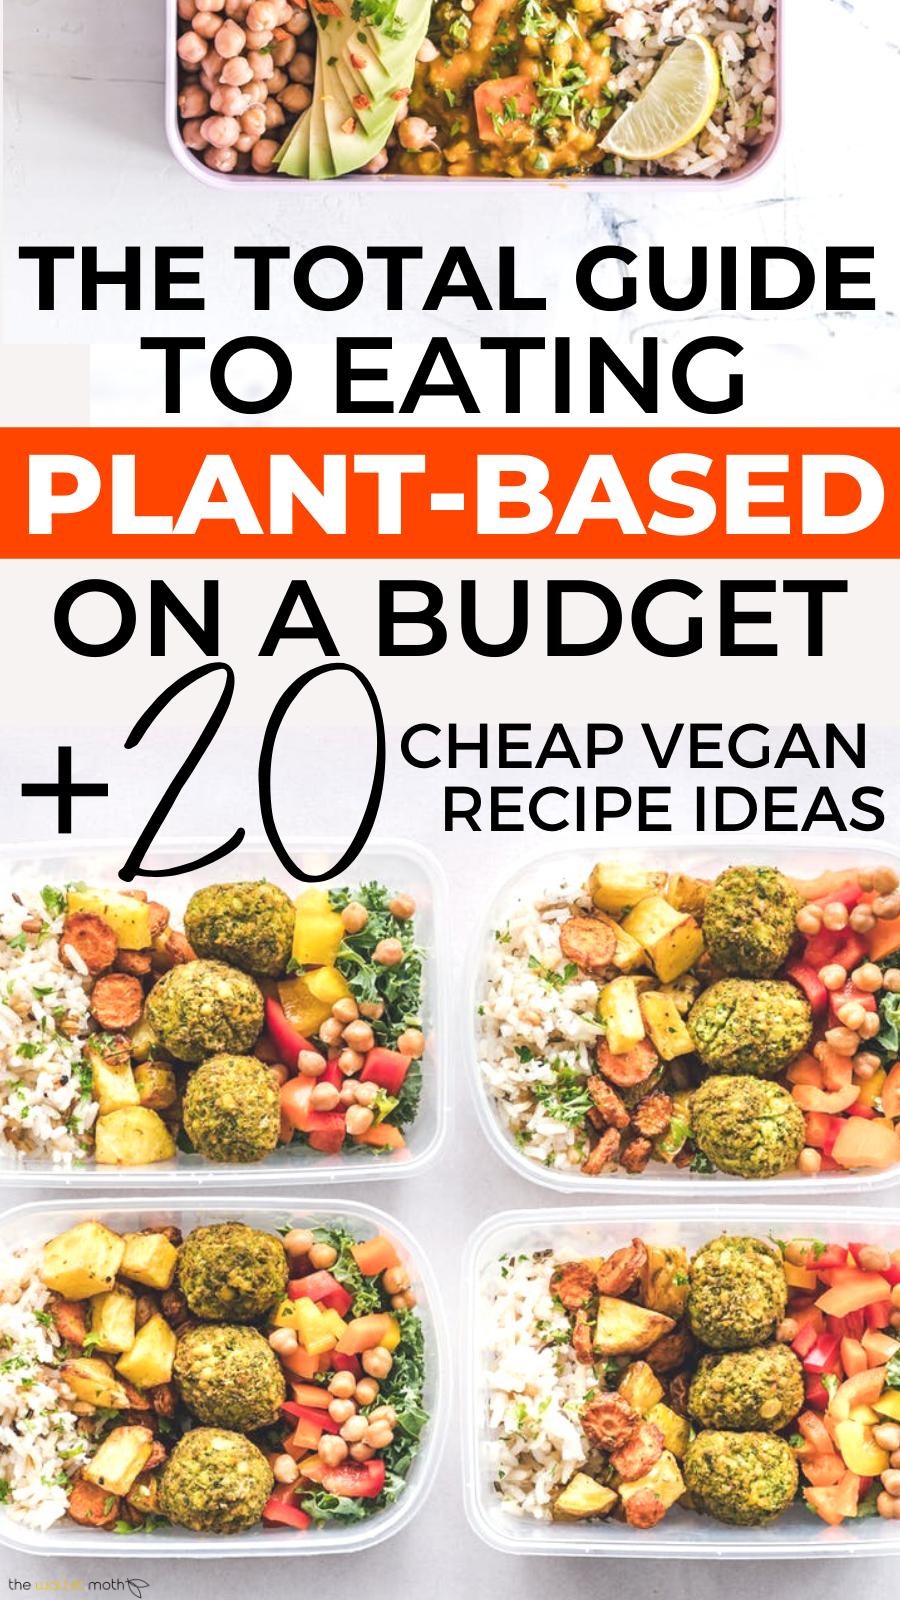 Plant Based On A Budget Vegan Meal Plan Grocery List Cheap Recipes Vegan Meal Plans Plant Based Eating Cheap Vegan Meals